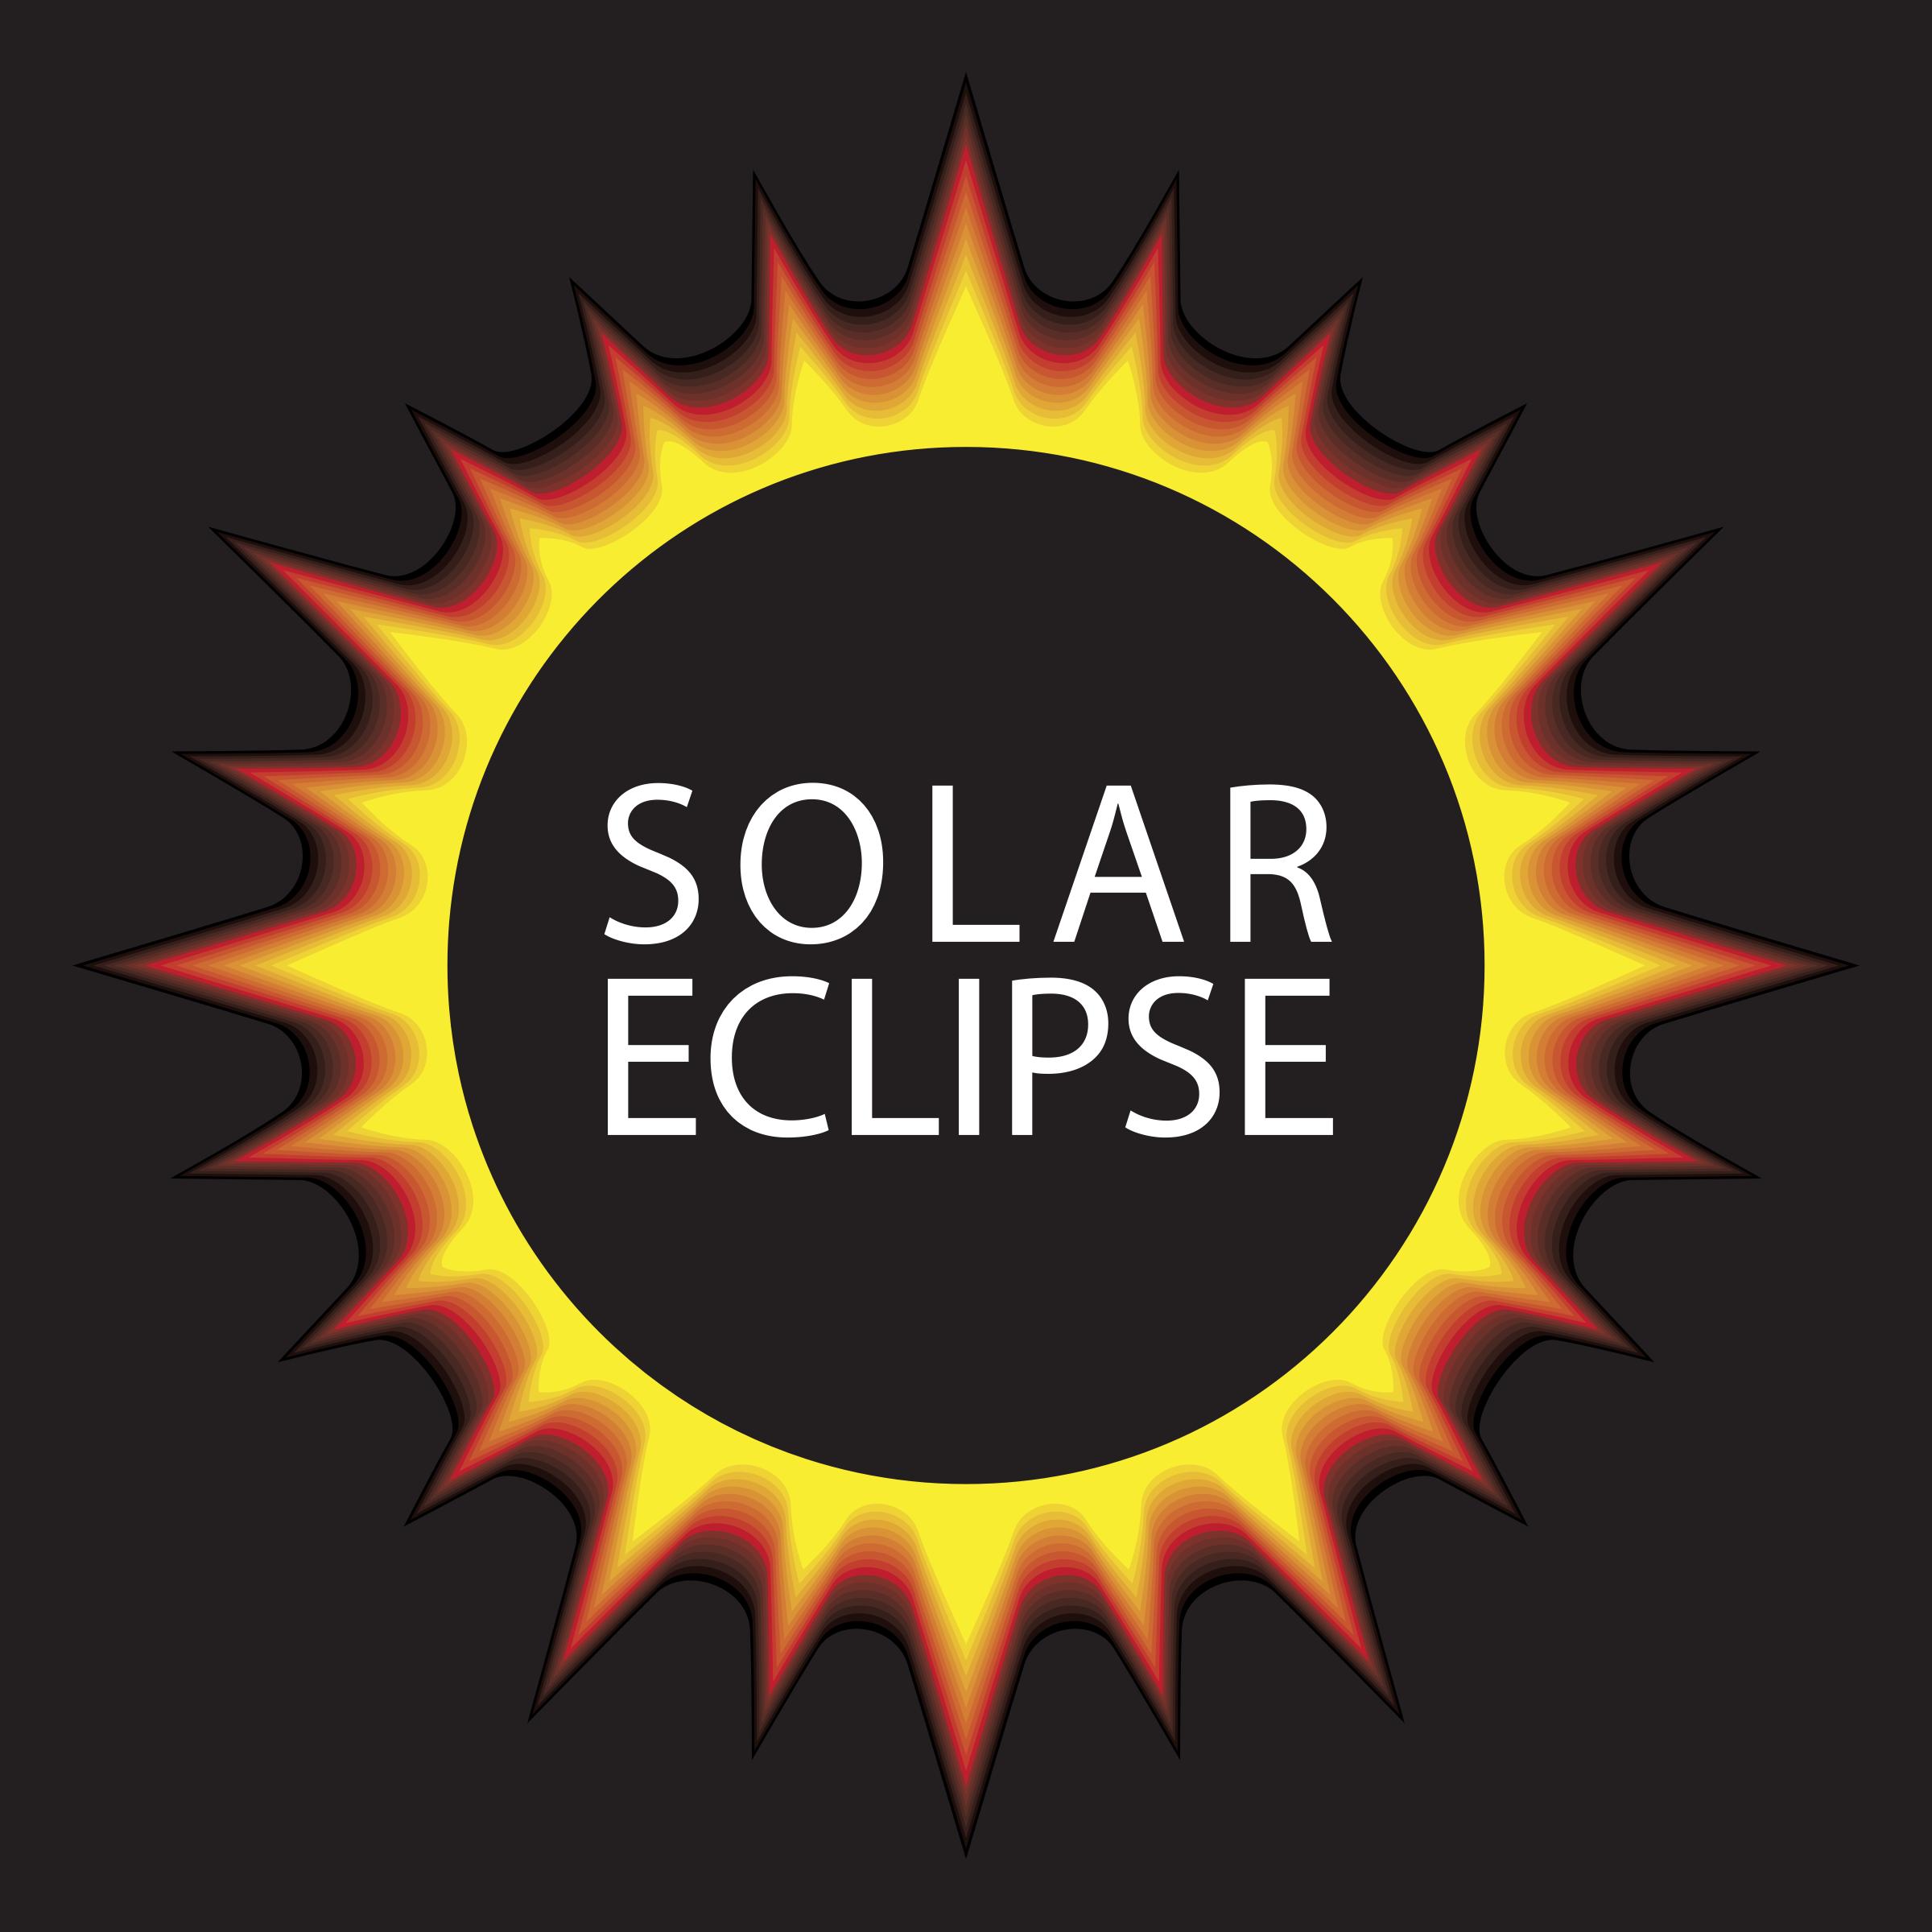 Eclipse clipart. Solar complete big image